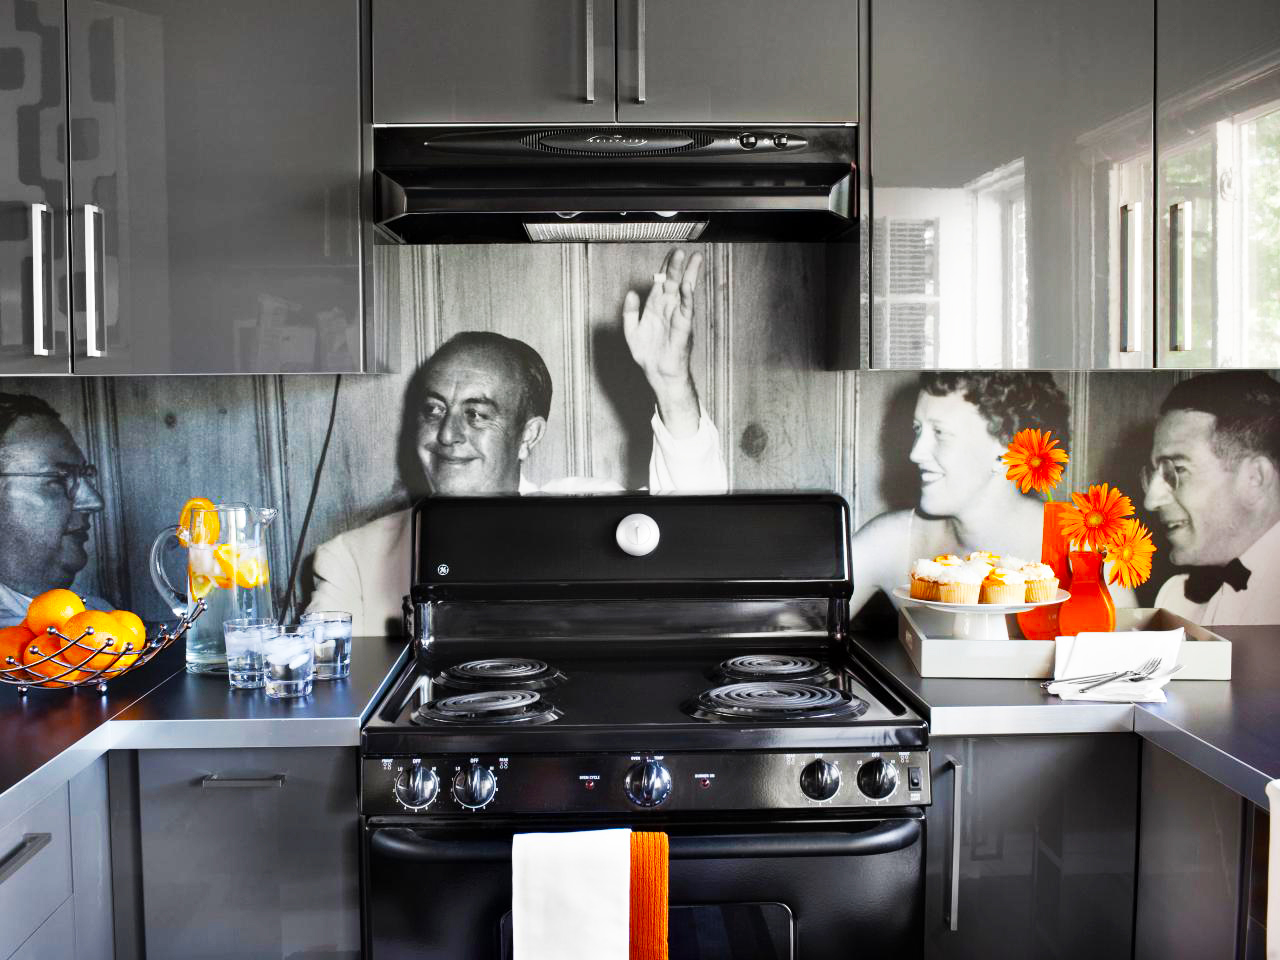 cost-to-remodel-kitchen-backsplah-with-kitchen-photo-backsplash-beauty-for-small-grey-kitchen-remodels-in-average-cost-remodeling-kitchen